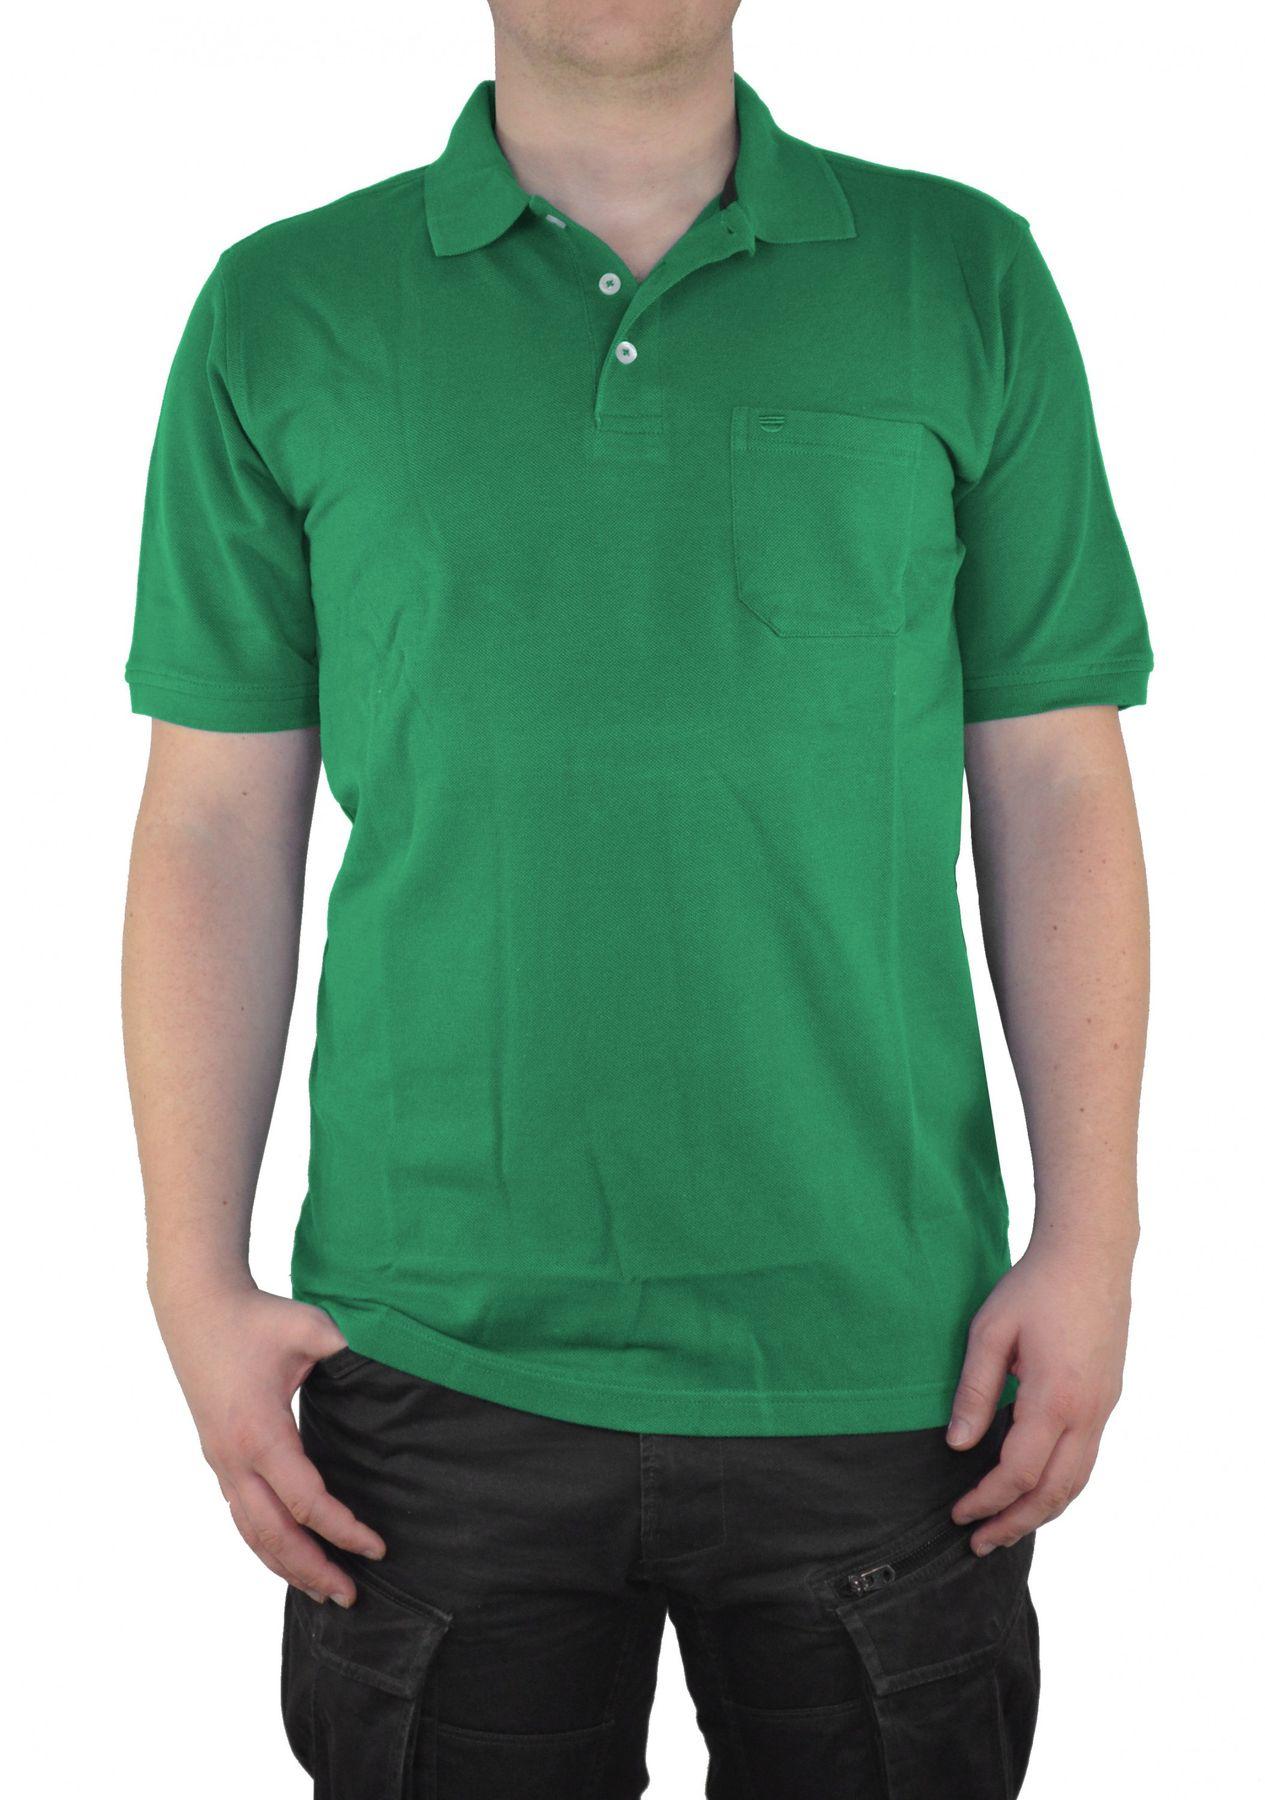 Redmond - Regular Fit - Herren Polo Shirt in verschiedenen Farben (900 A) – Bild 5